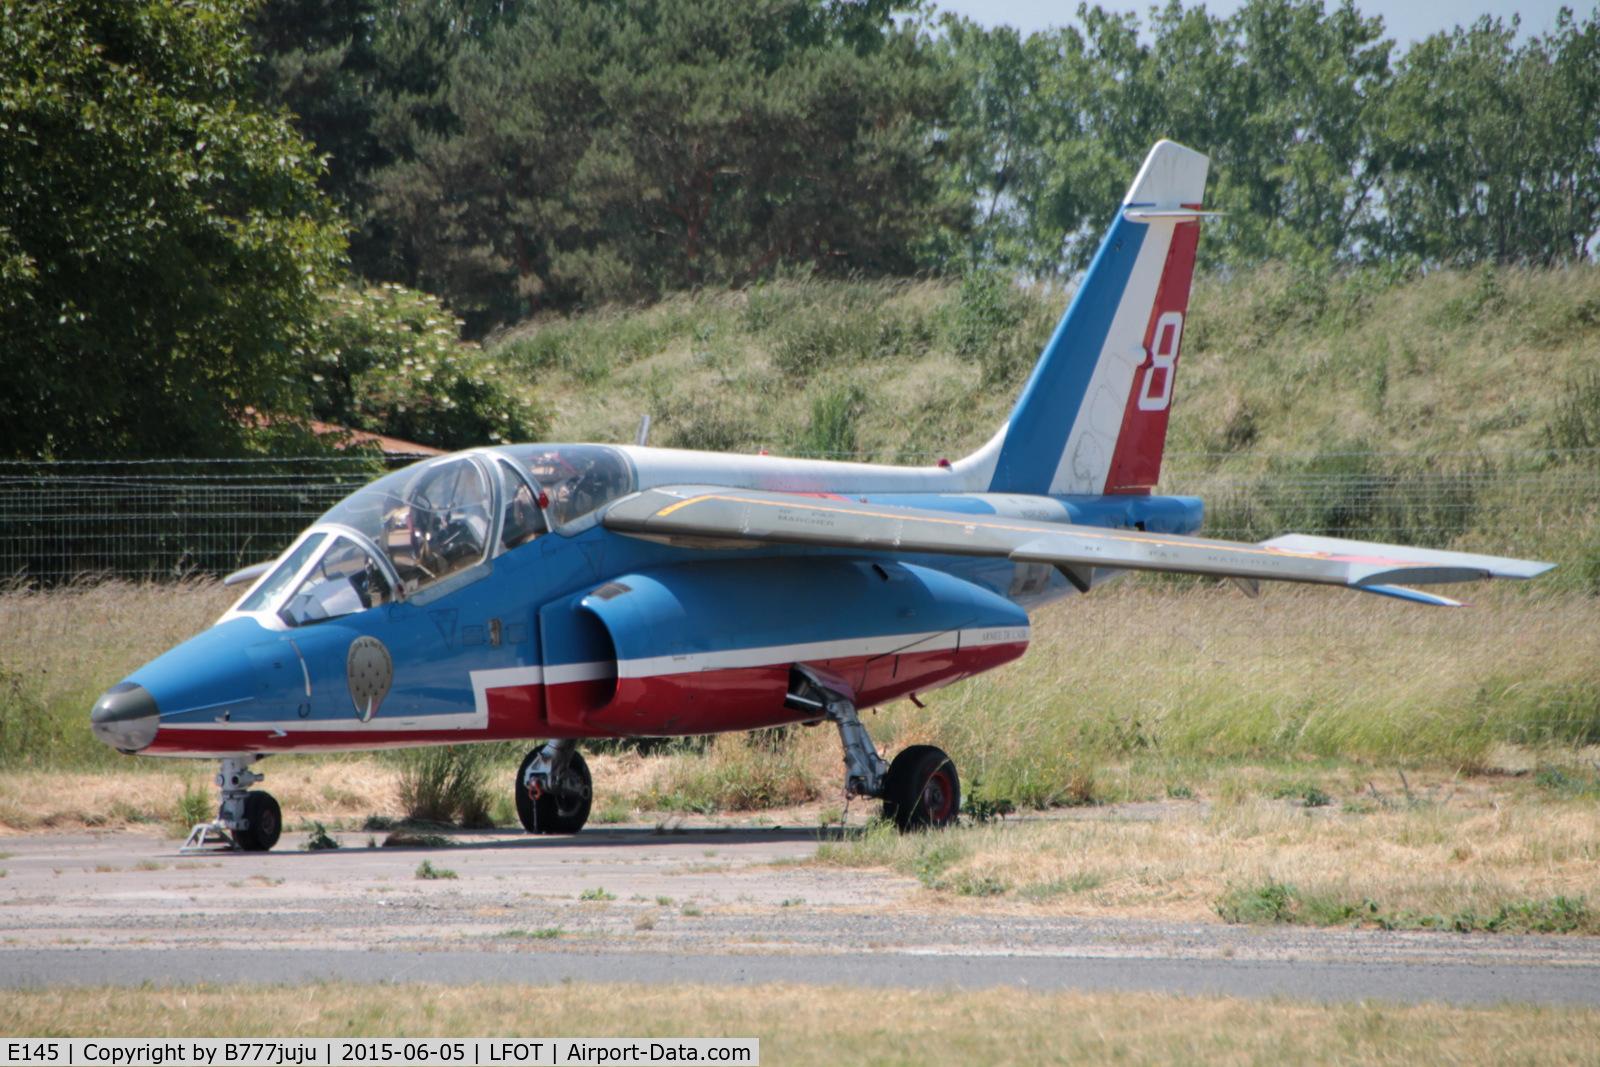 E145, Dassault-Dornier Alpha Jet E C/N E145, use for fire training at Tours